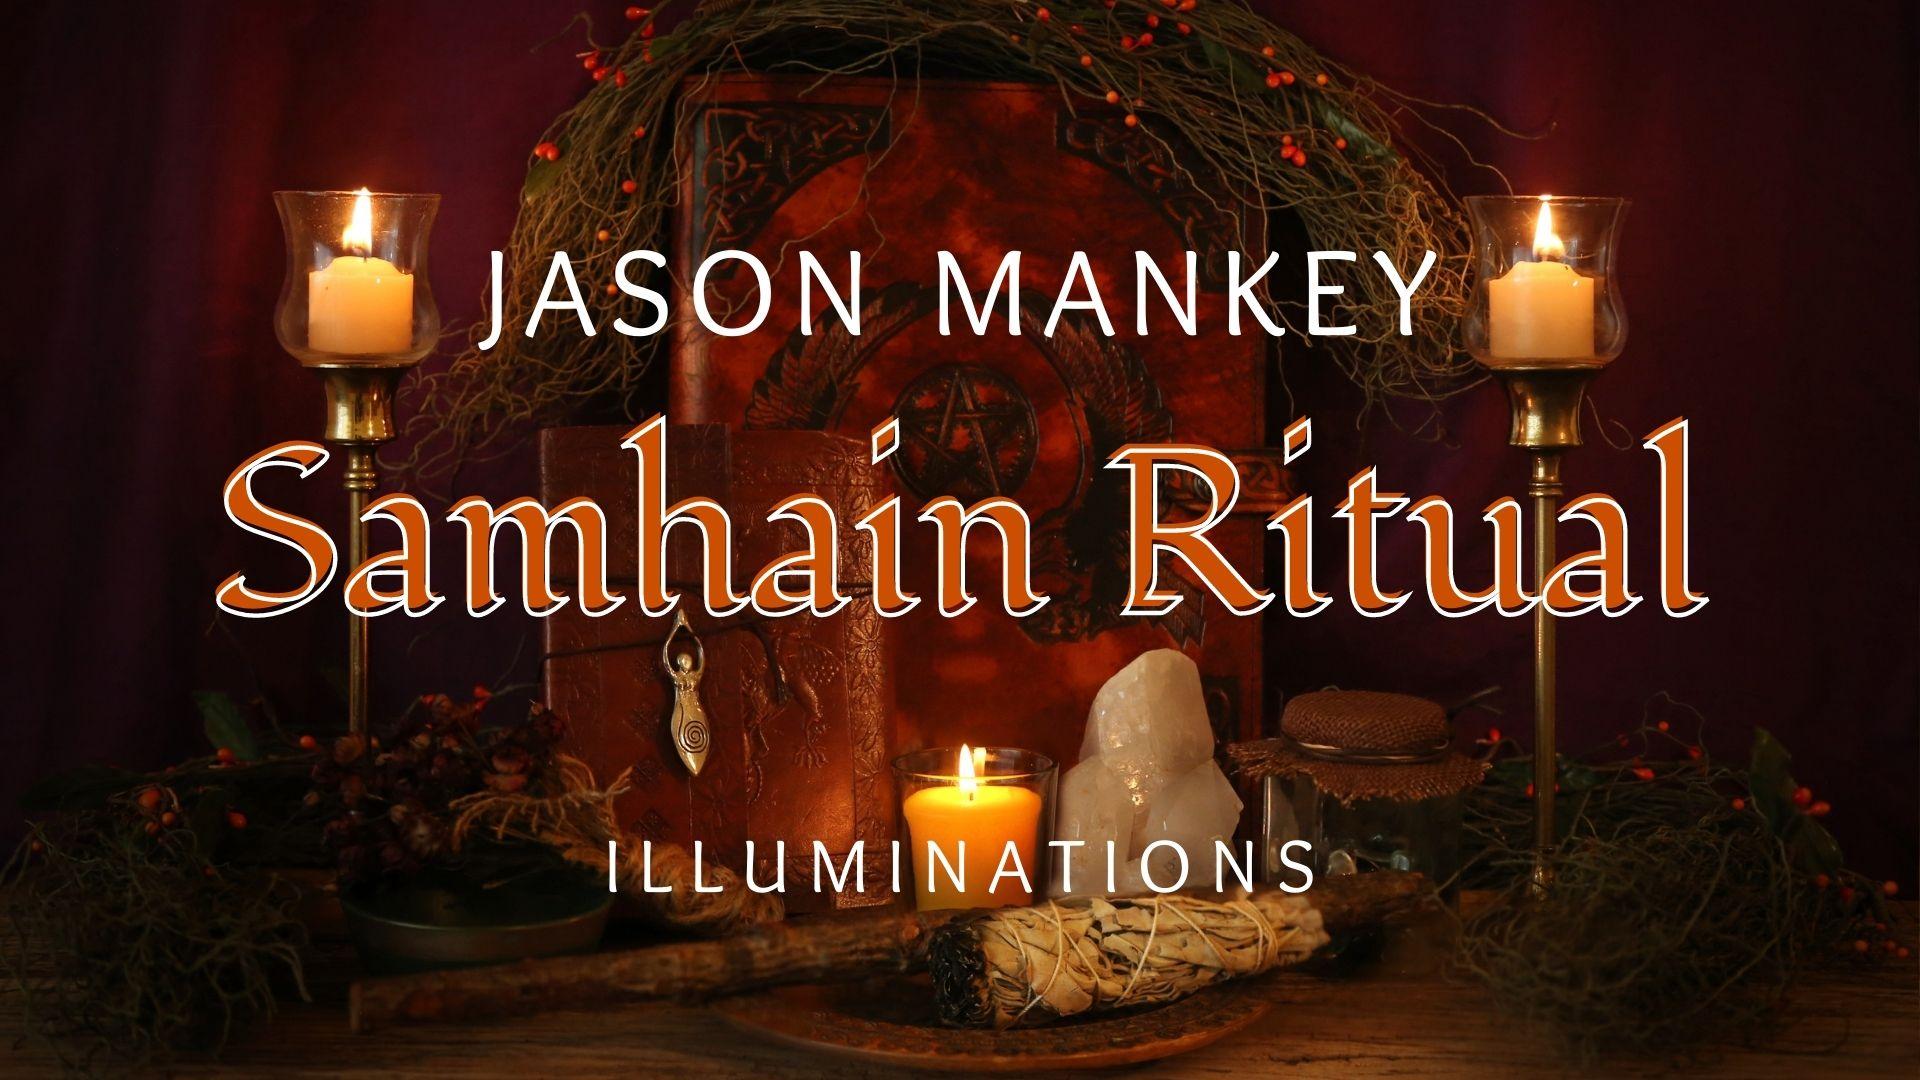 Samhain Ritual with Jason Mankey